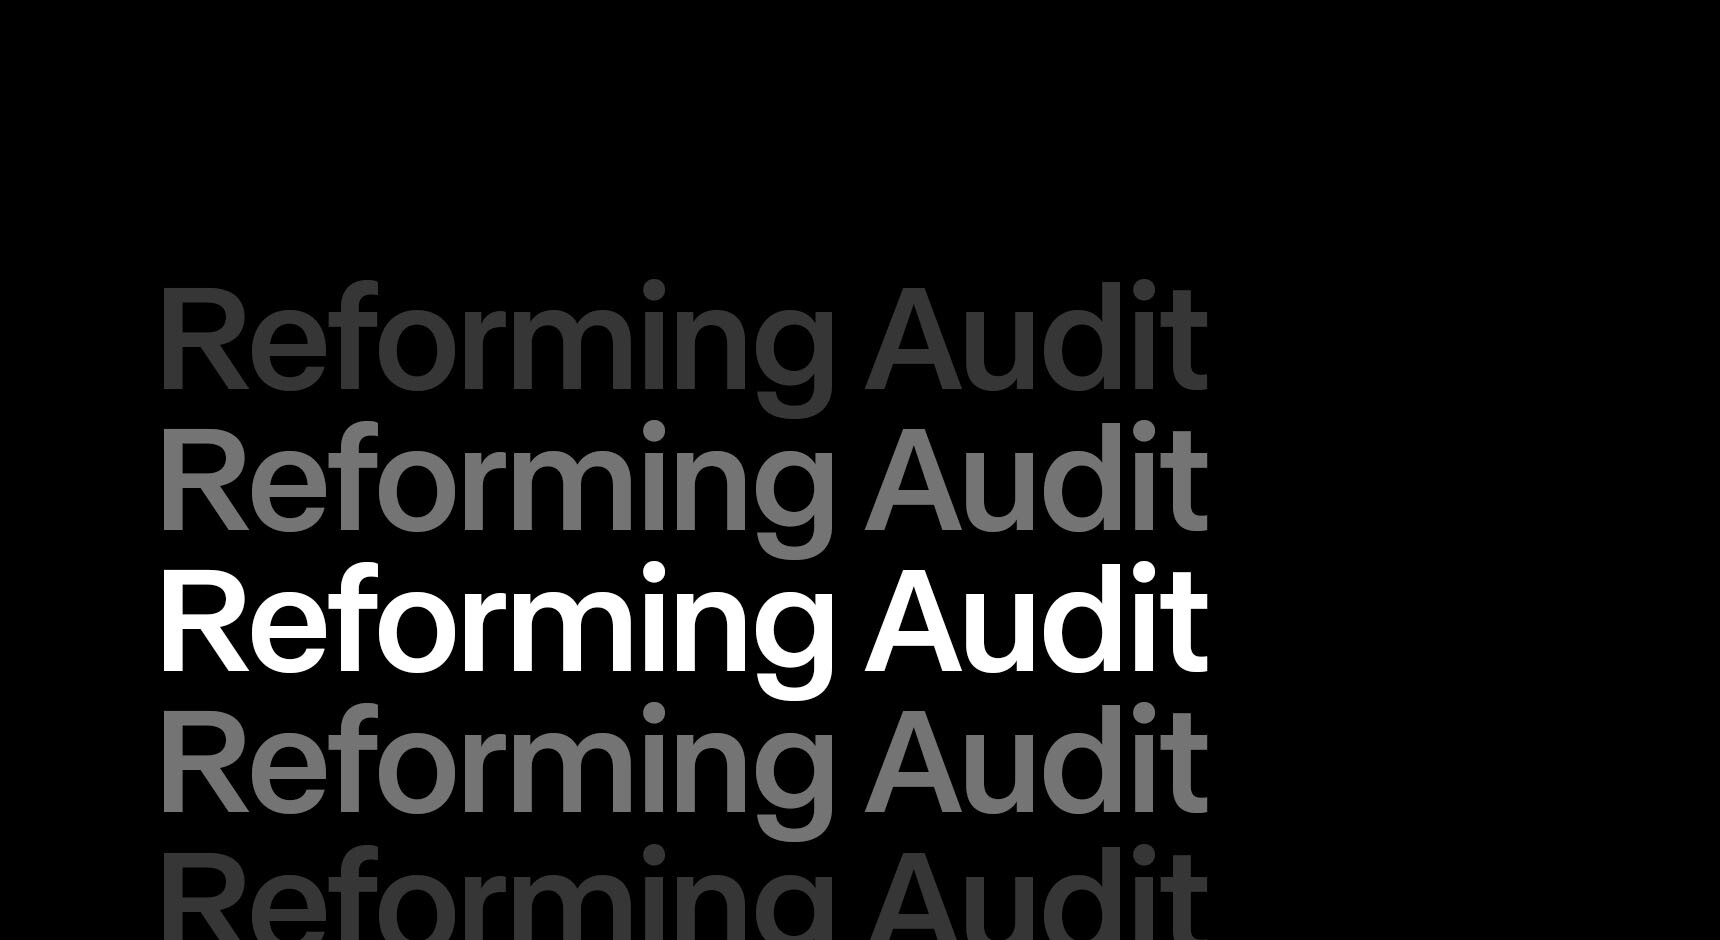 Luminate_Reforming_Audit_image_1720x940_r3